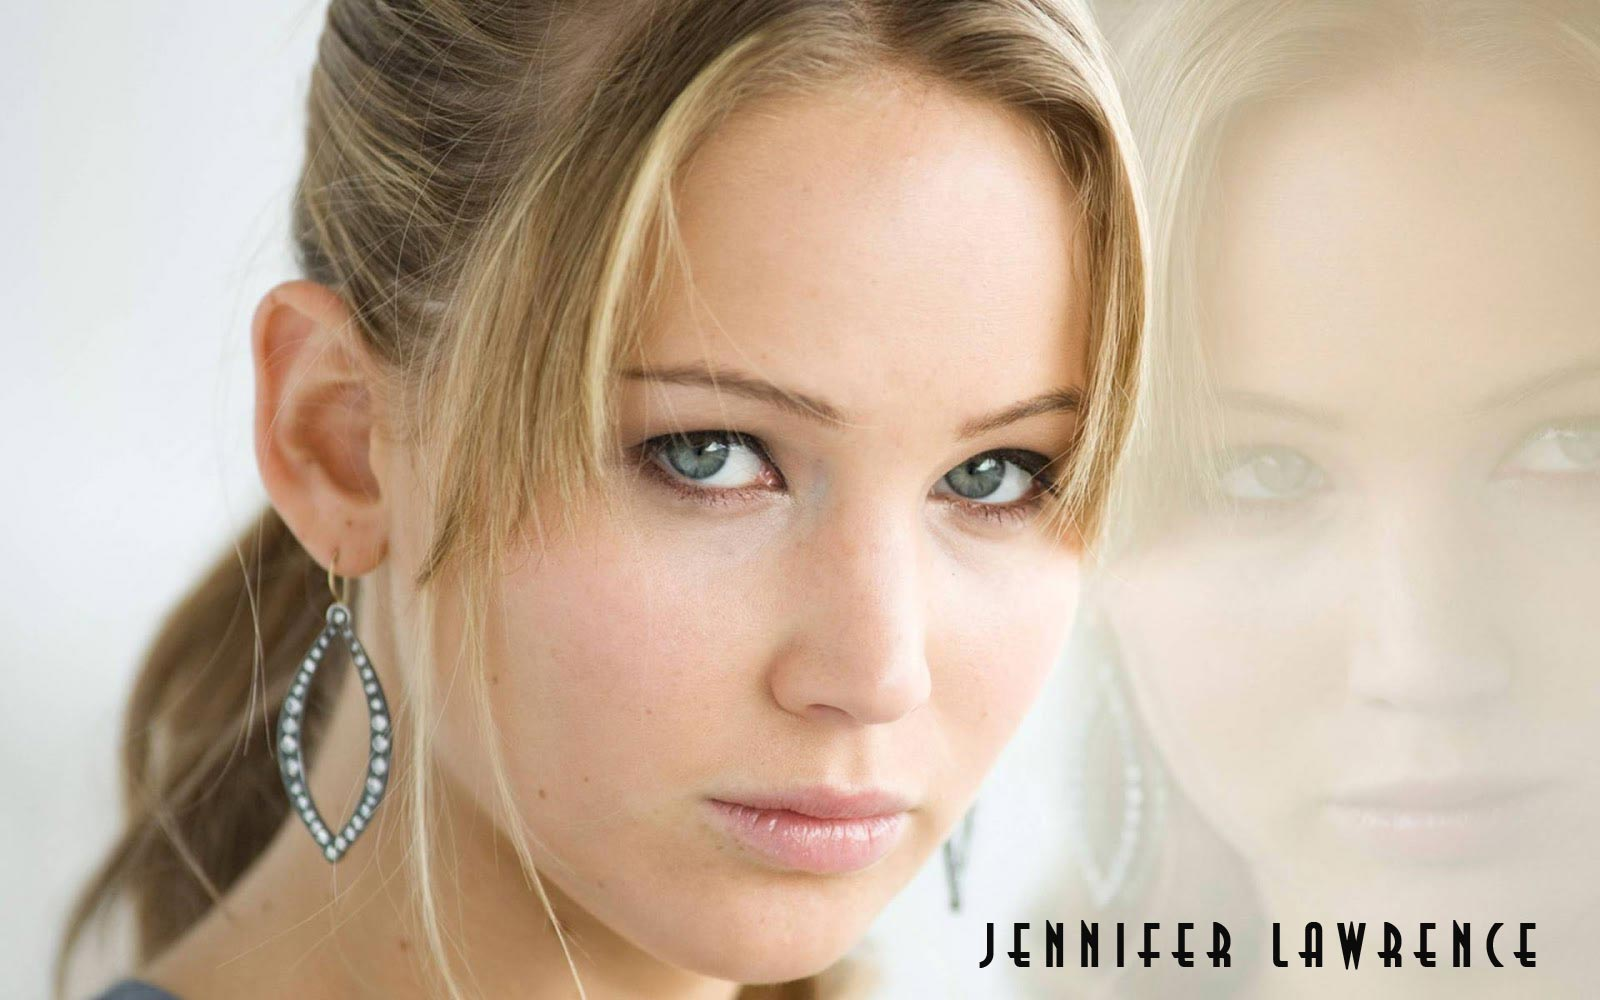 Jennifer lawrence wallpaper High Quality WallpapersWallpaper 1600x1000